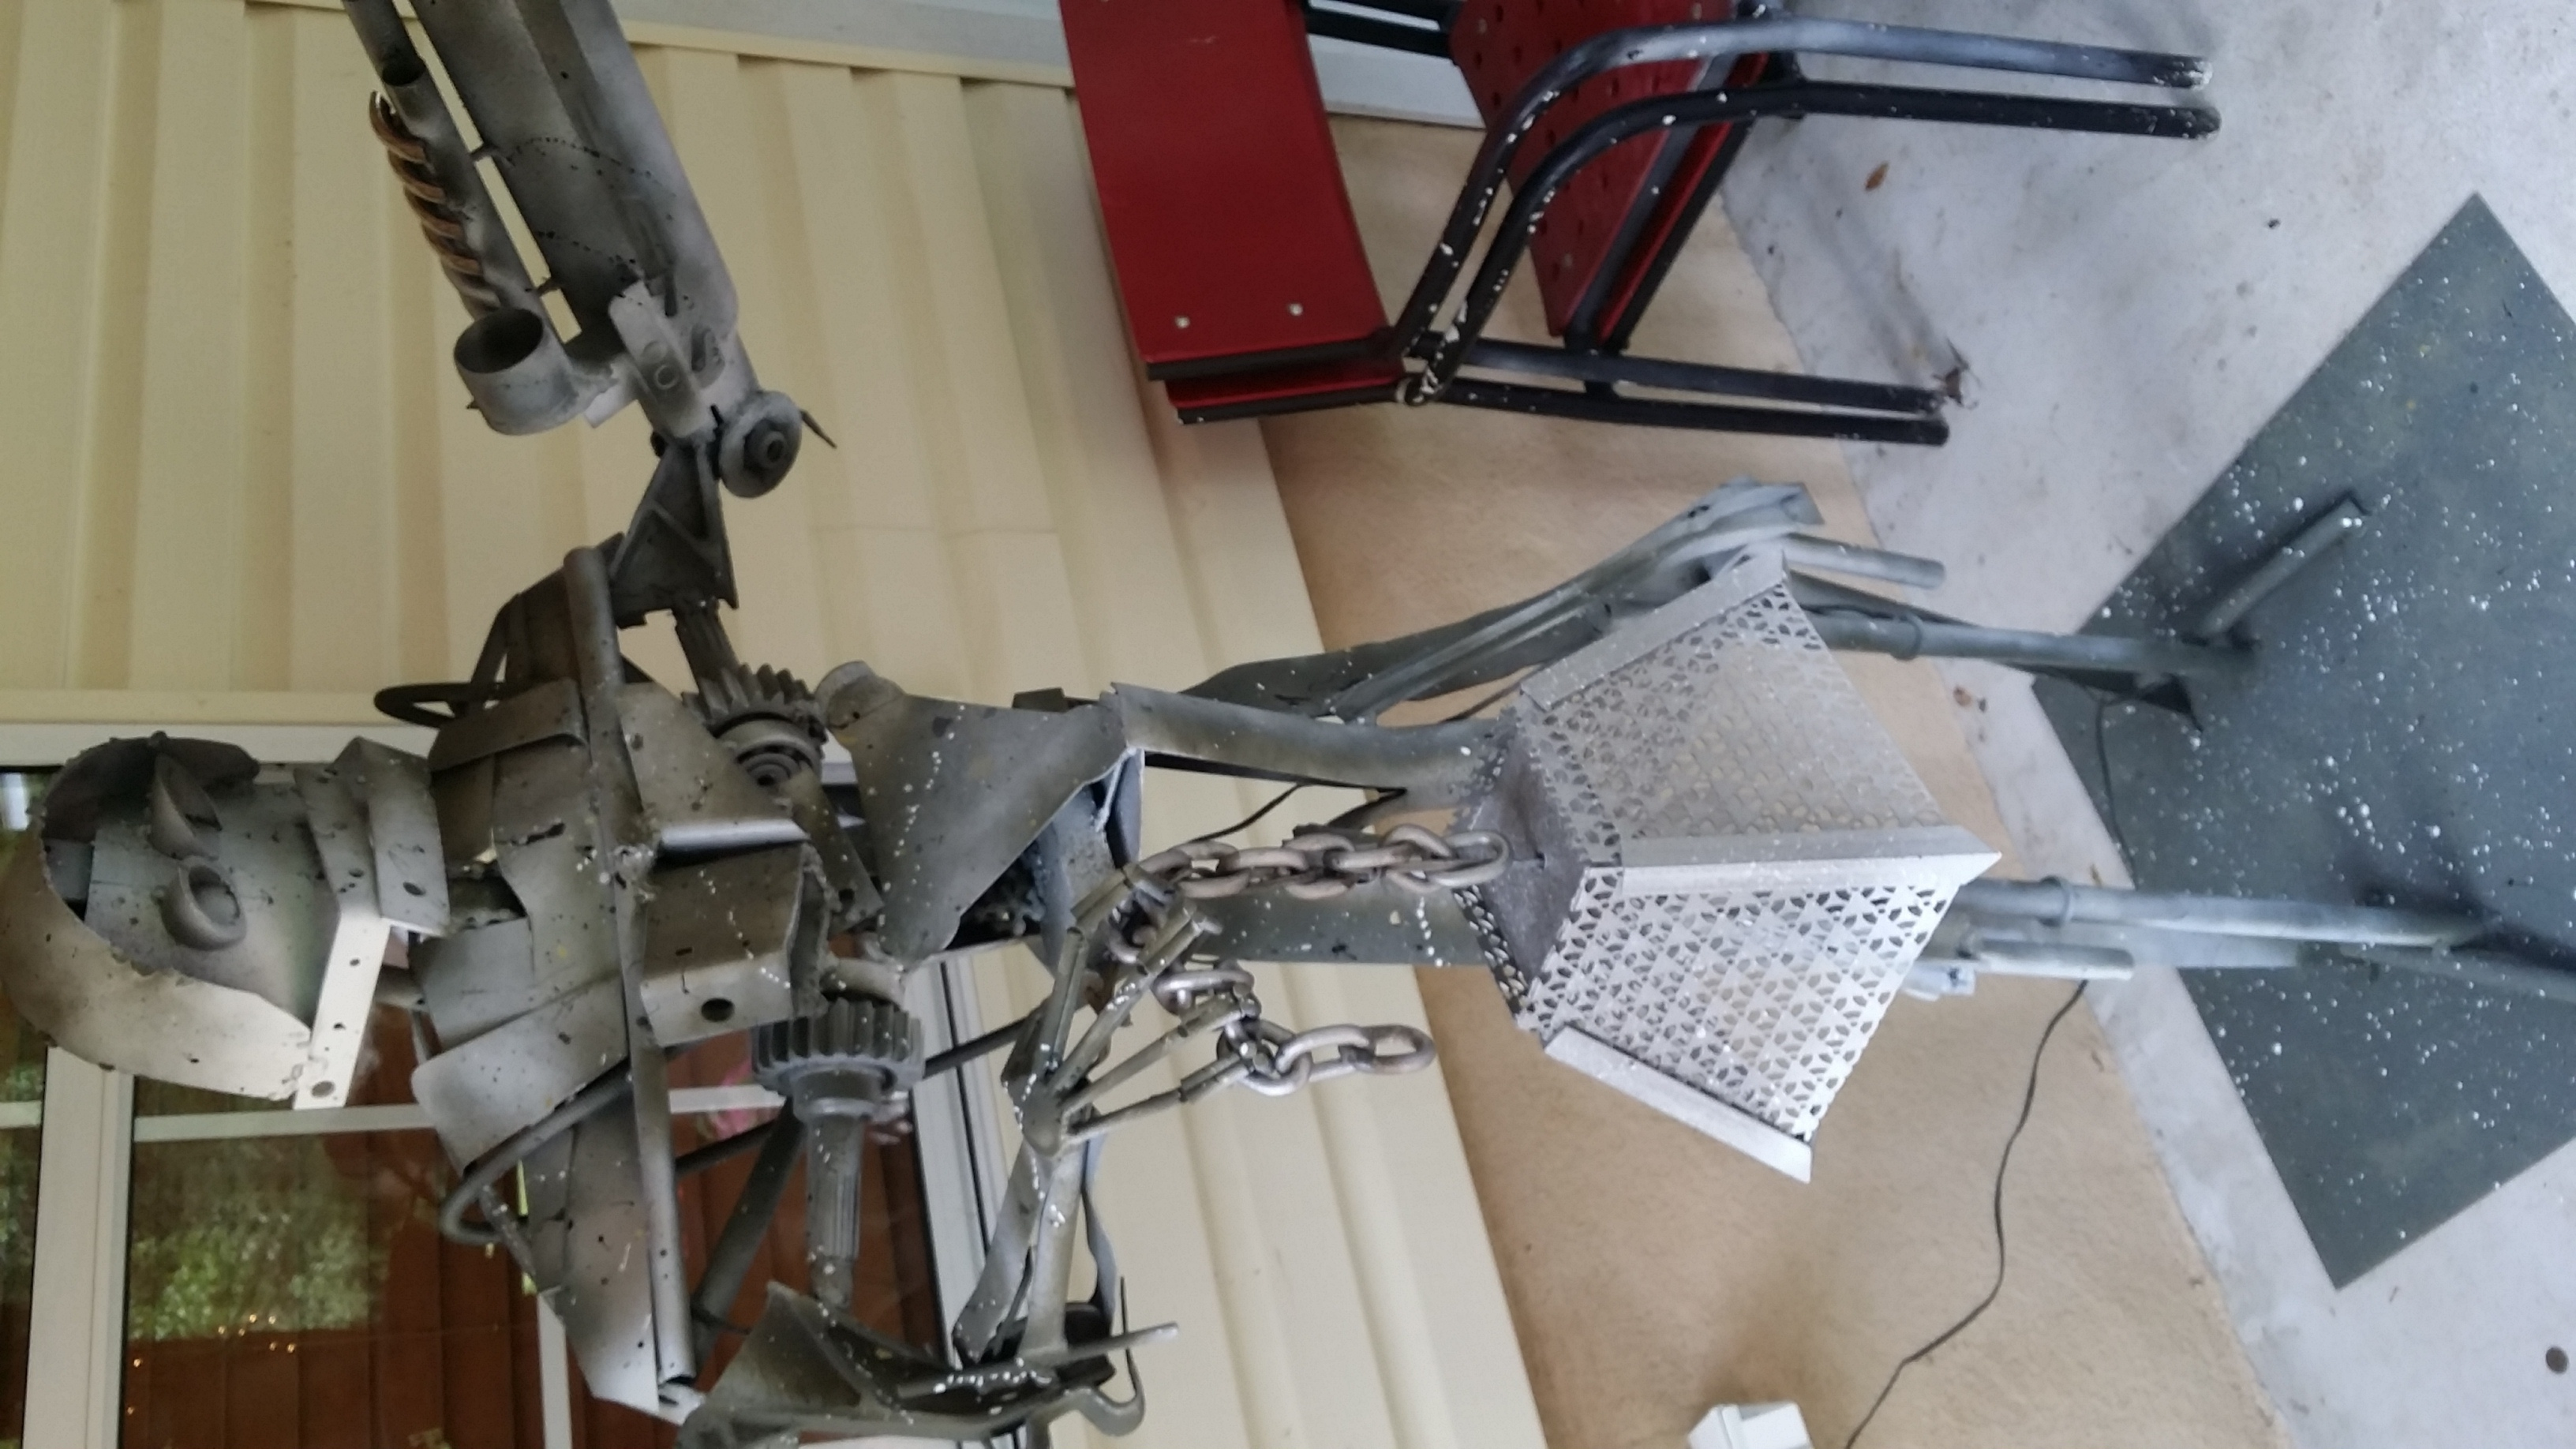 Julian Allegro Artwork 6ft Lifesize Steel Robot Lamp With